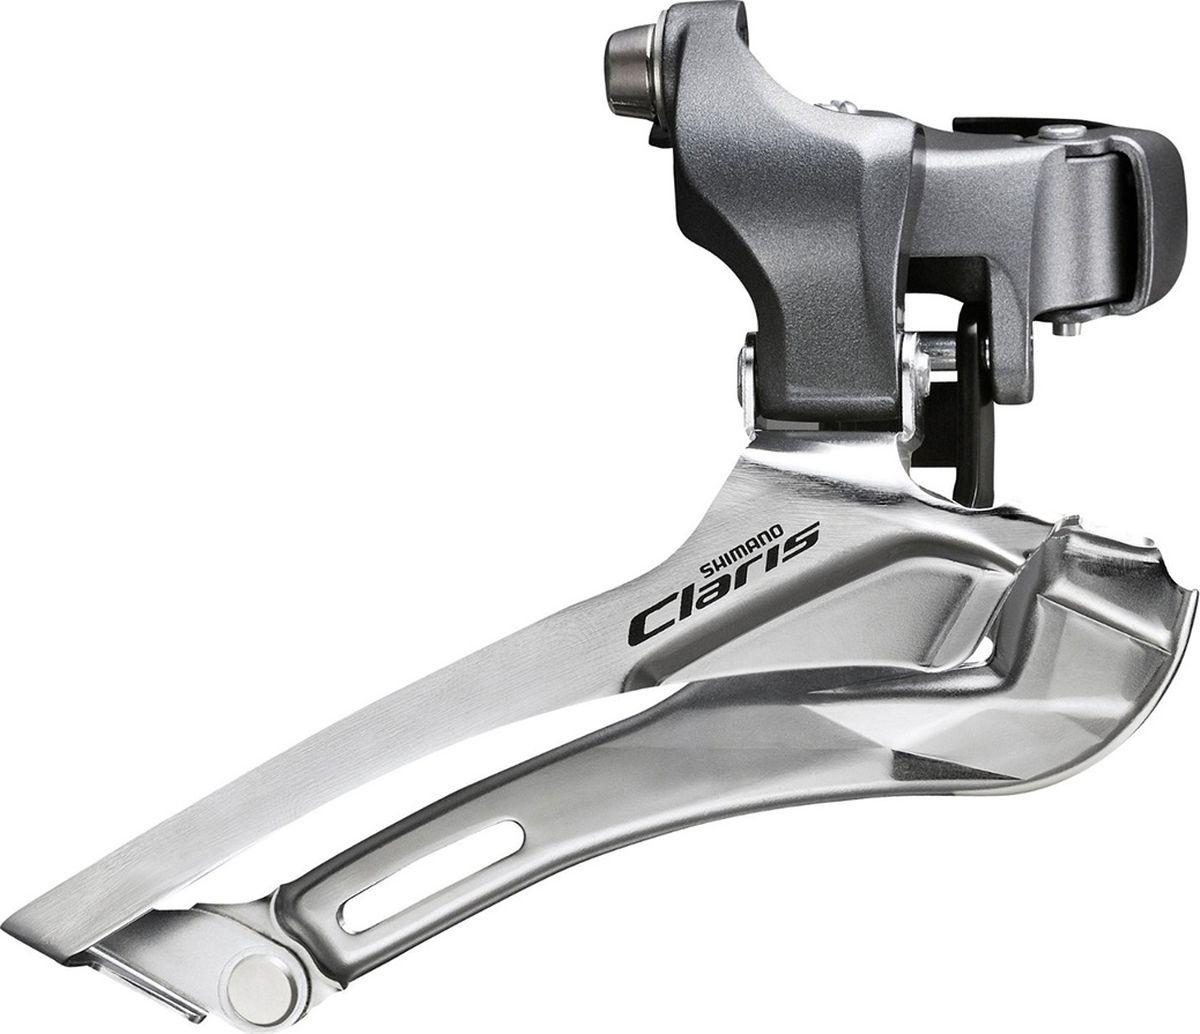 Переключатель передний Shimano Claris 2400, 2 x 8 скоростей, на упор переключатель передний велосипедный shimano claris 2403 3x8 скоростей на упор efd2403f page 4